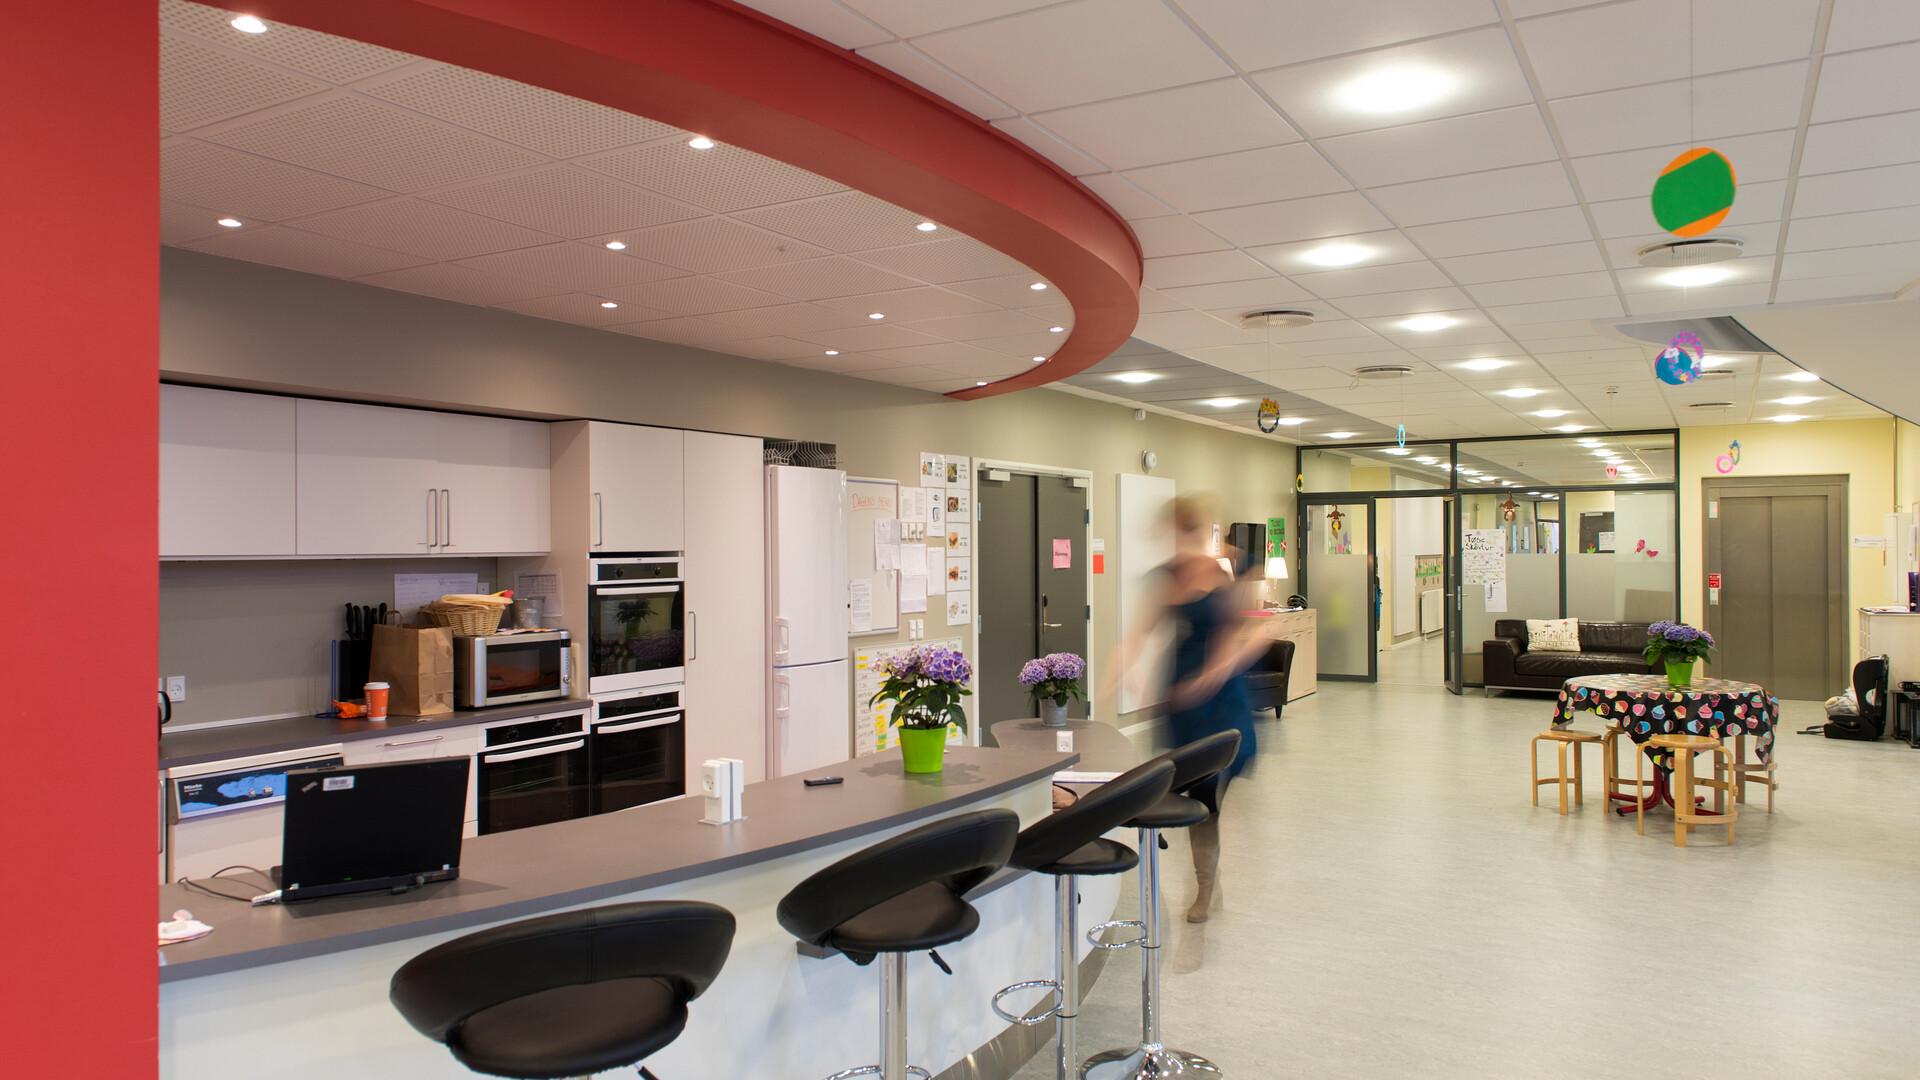 Helsinge Realskole school education Rockfon Color-all Sonar E-edge A-edge 600x600 1200x600 VertiQ 2700x1200